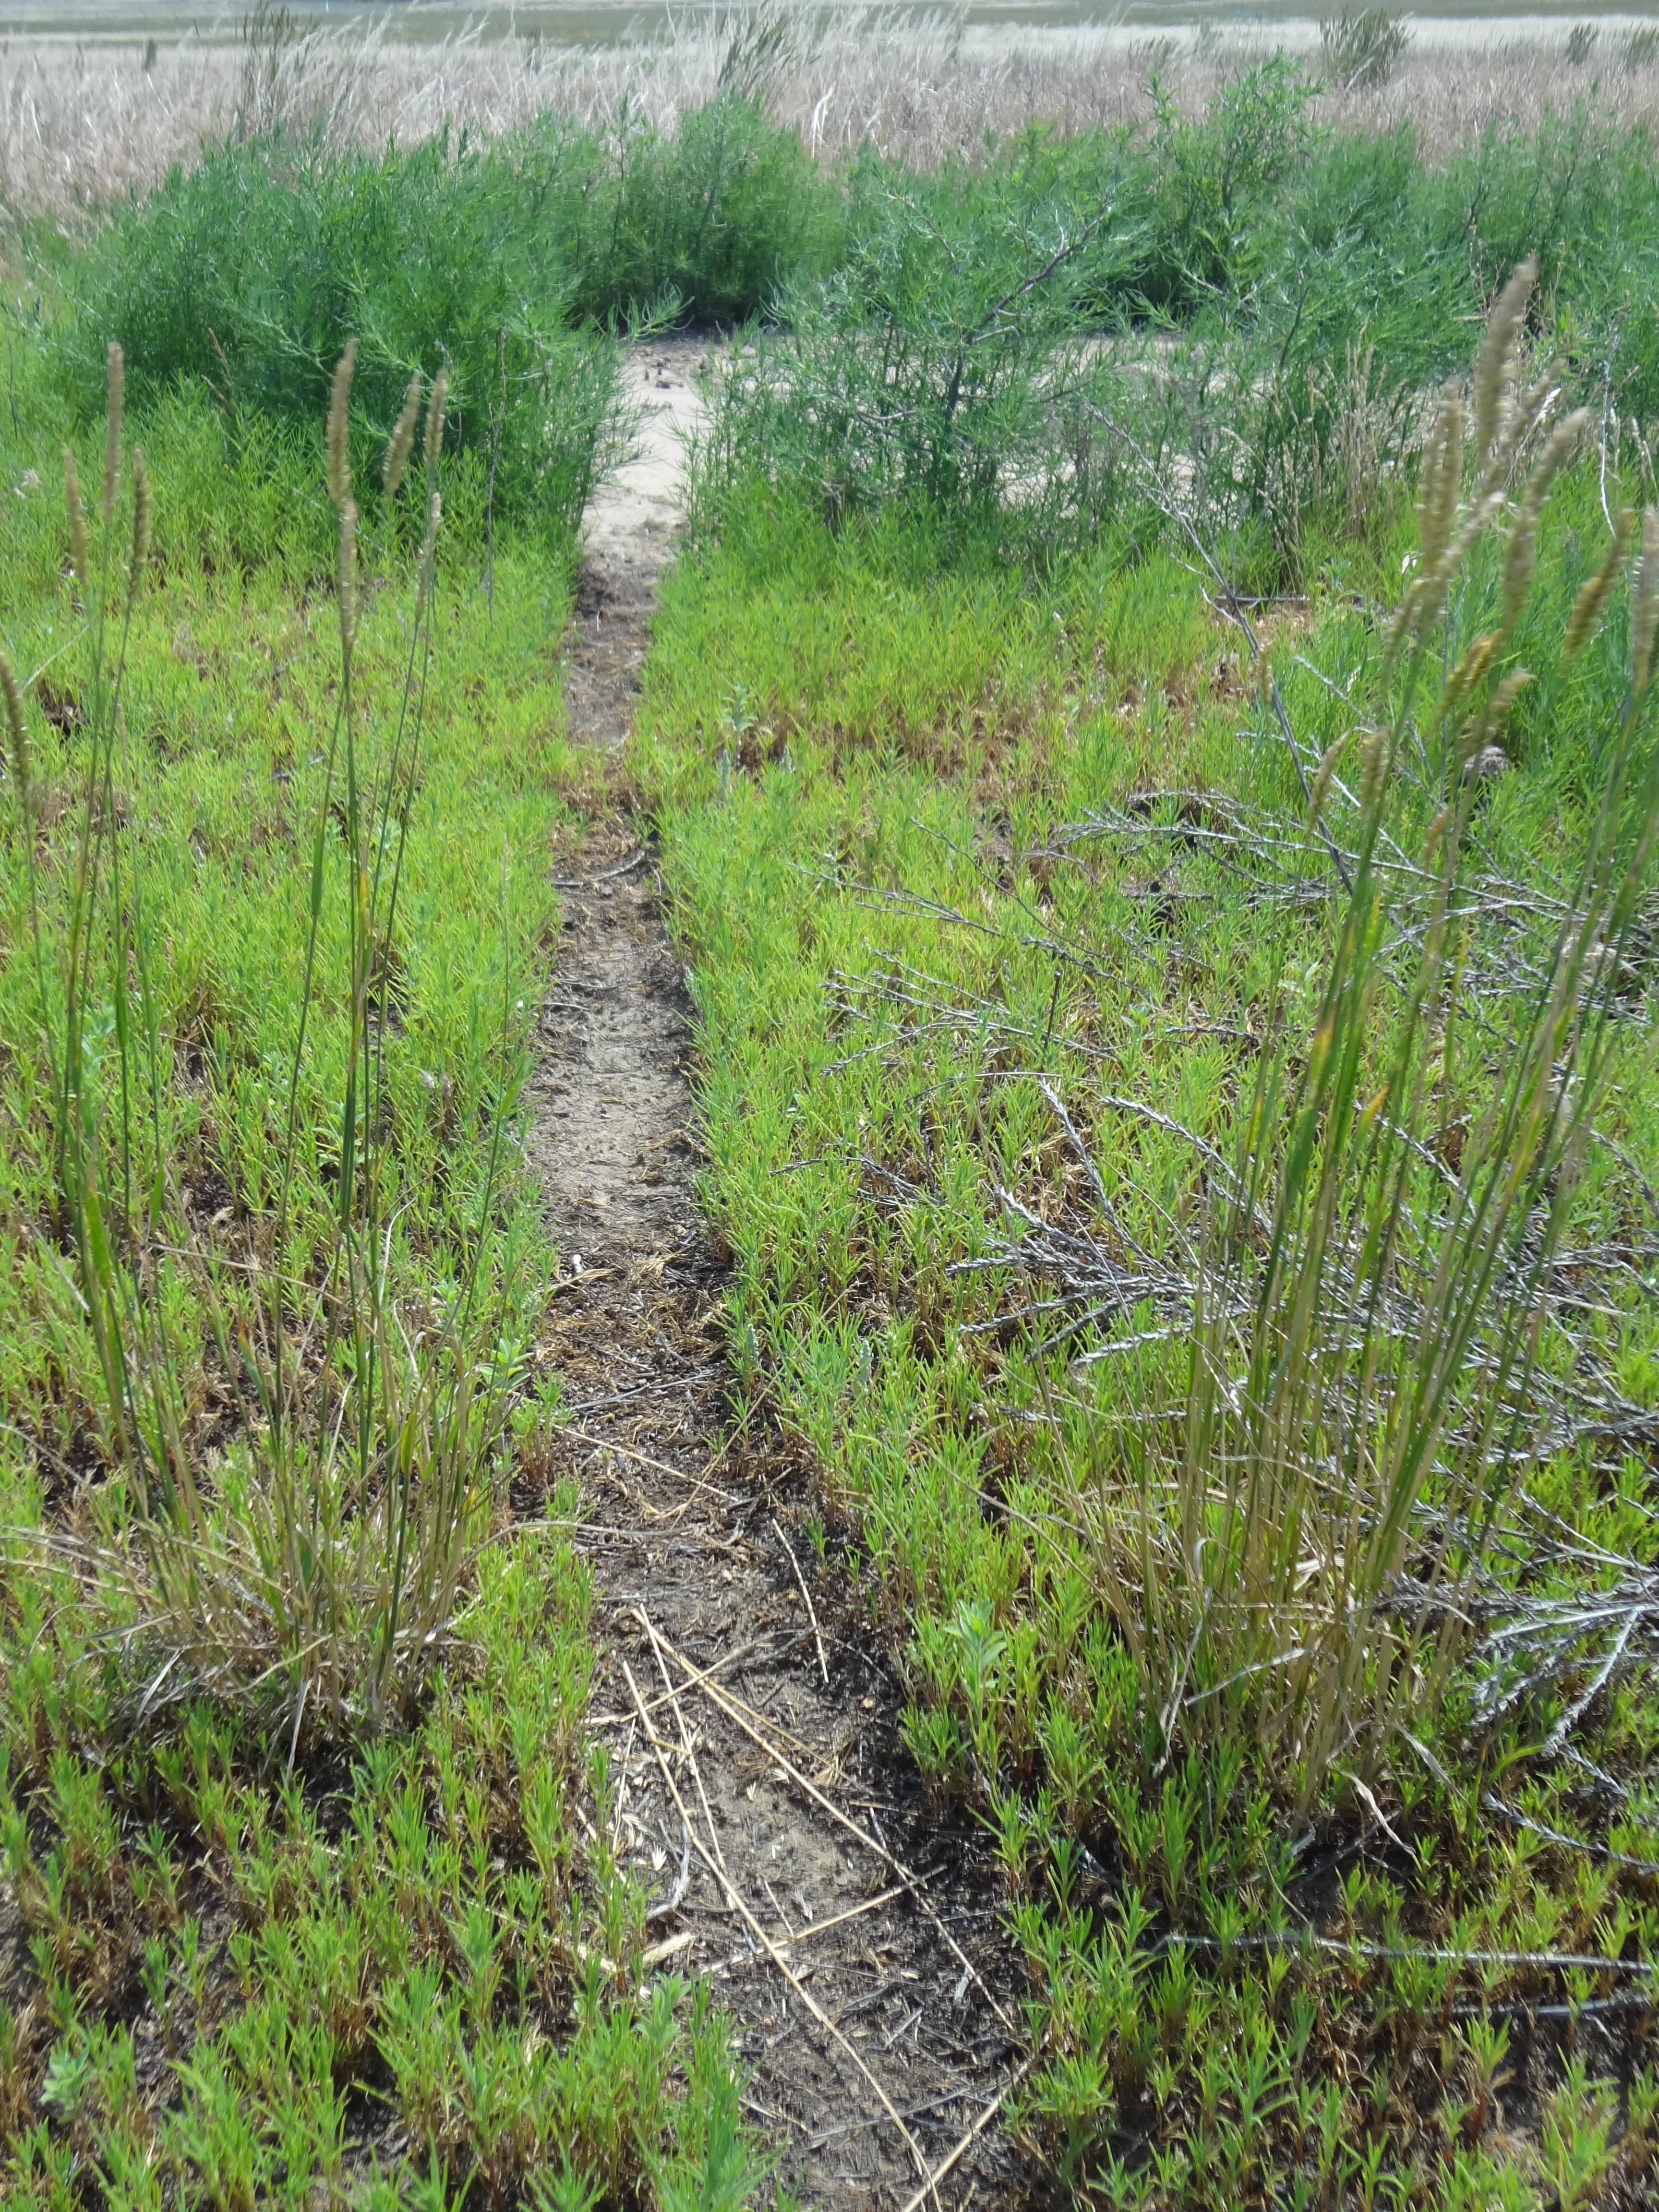 Rodent run, Thunder Basin National Grassland, WY